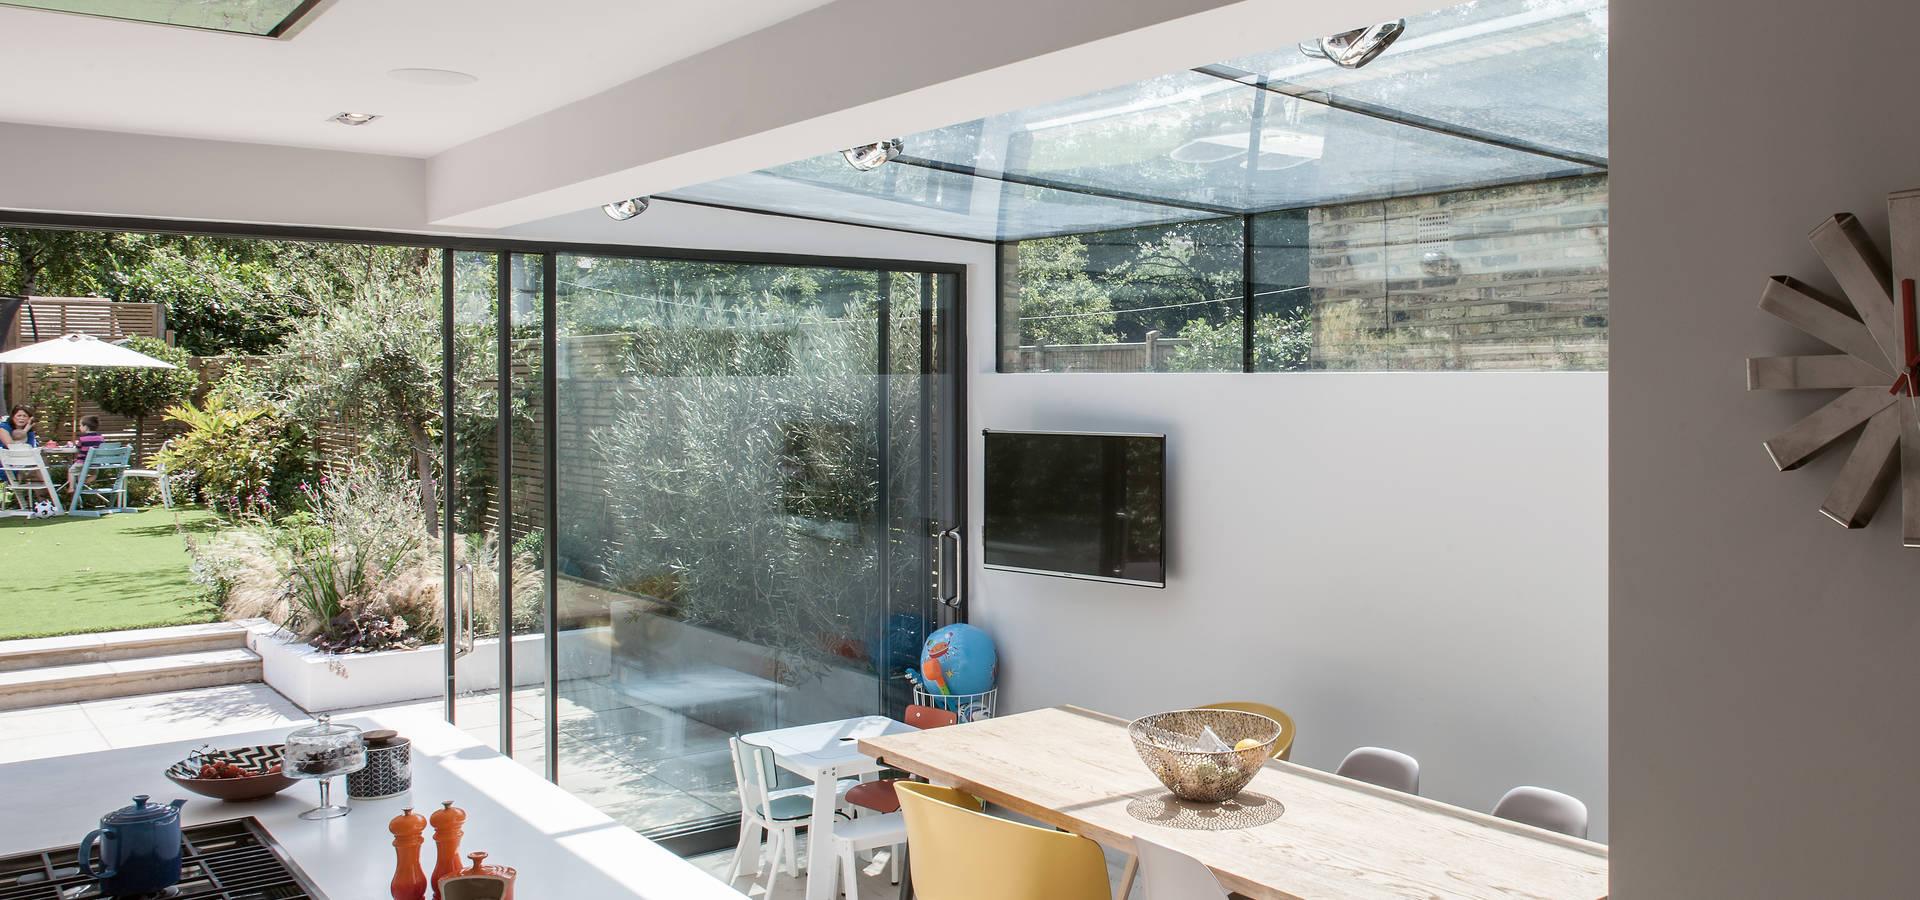 Red Squirrel Architects Ltd